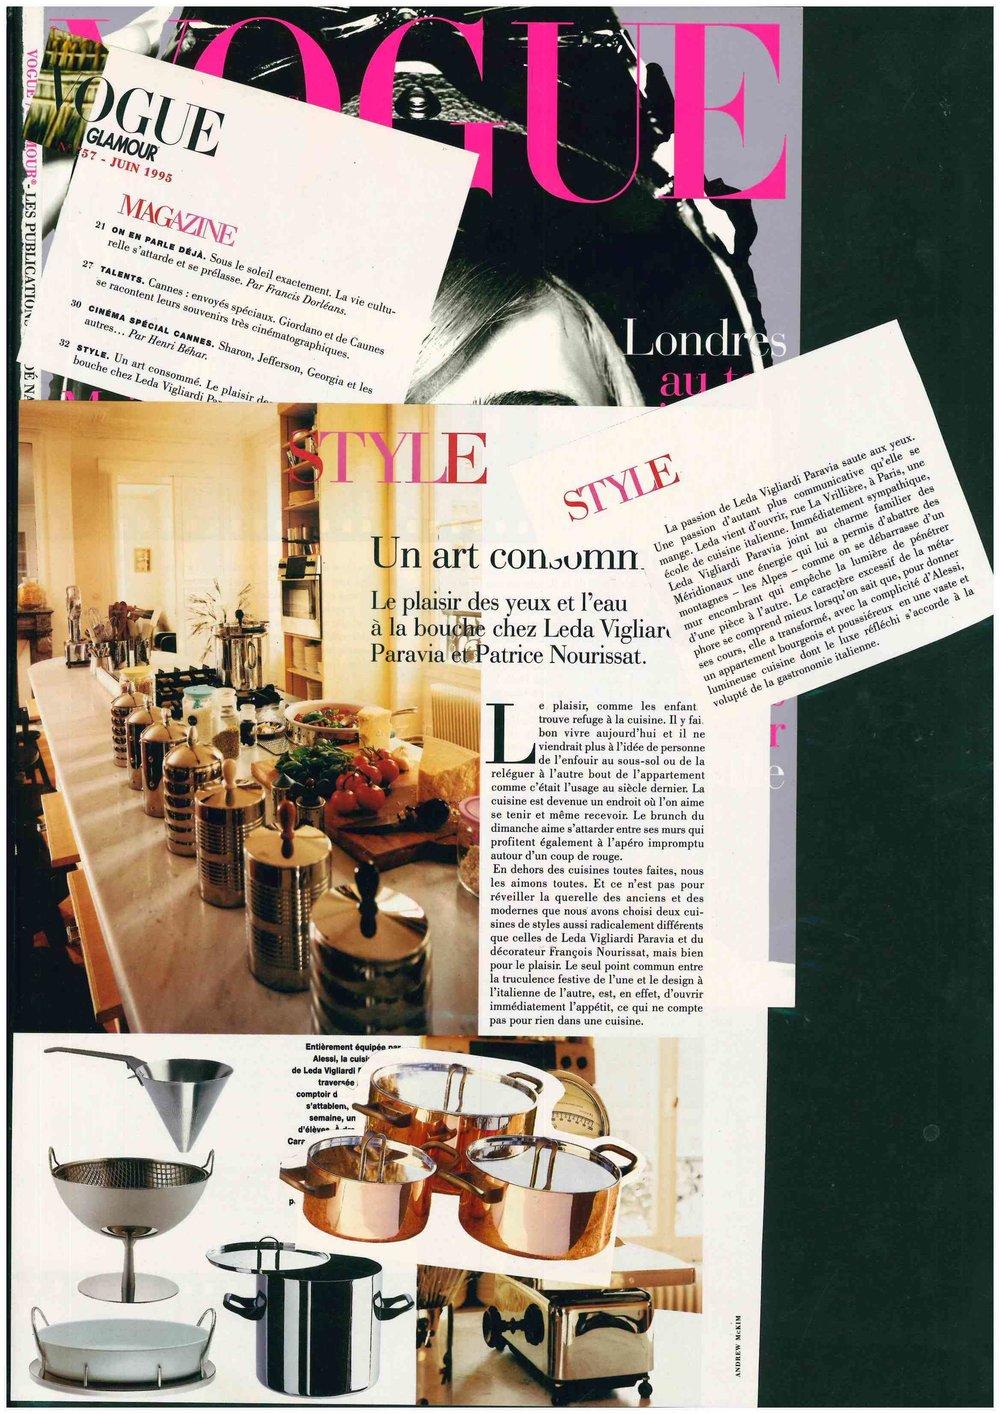 Pubblicazione Originale - Vogue FR - Glamour - June 1995